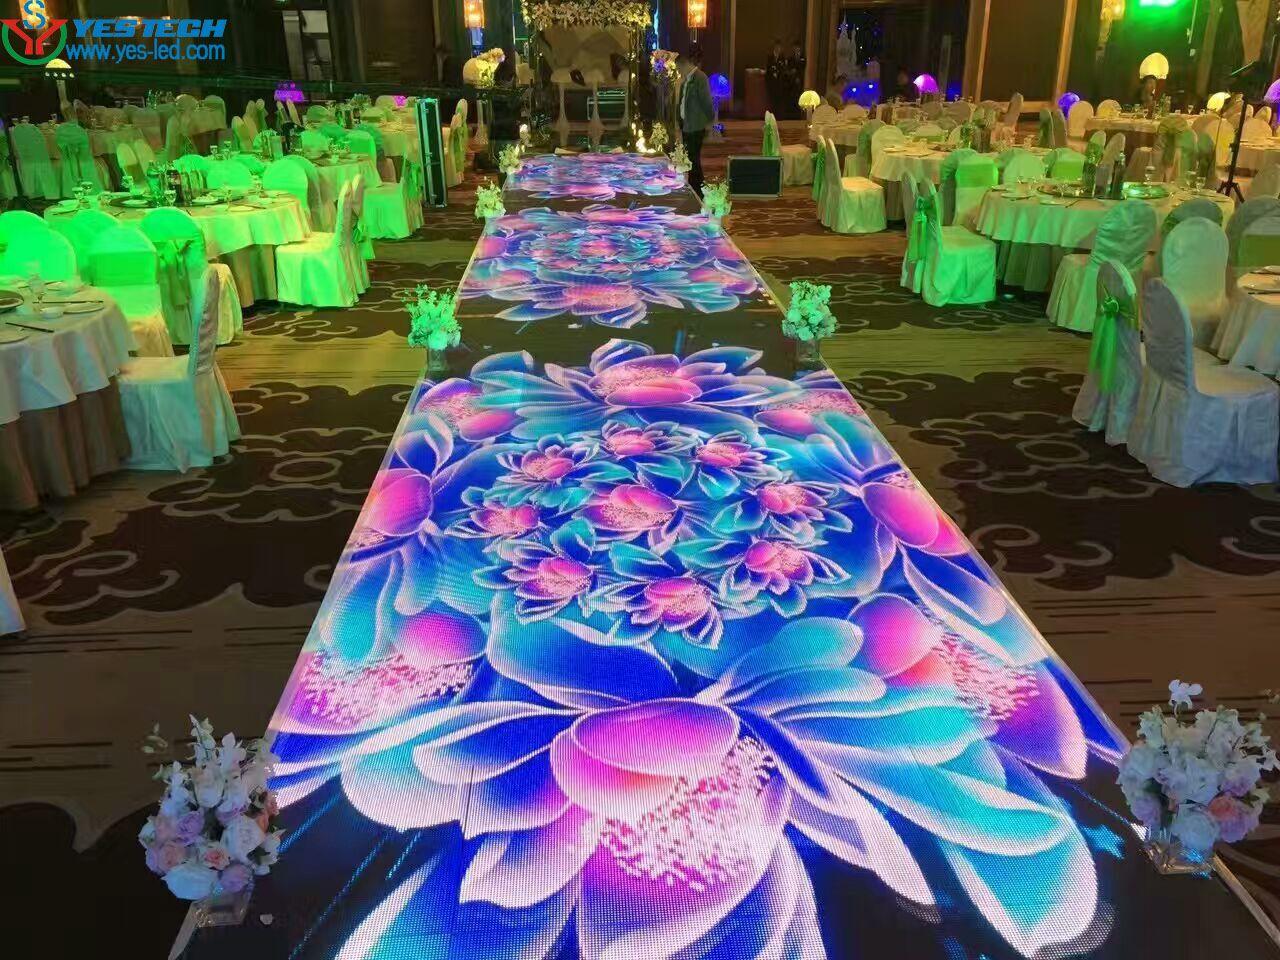 Magic Stage Led Screen Used As Dance Floor In Wedding HD Visual Feast Adjustable